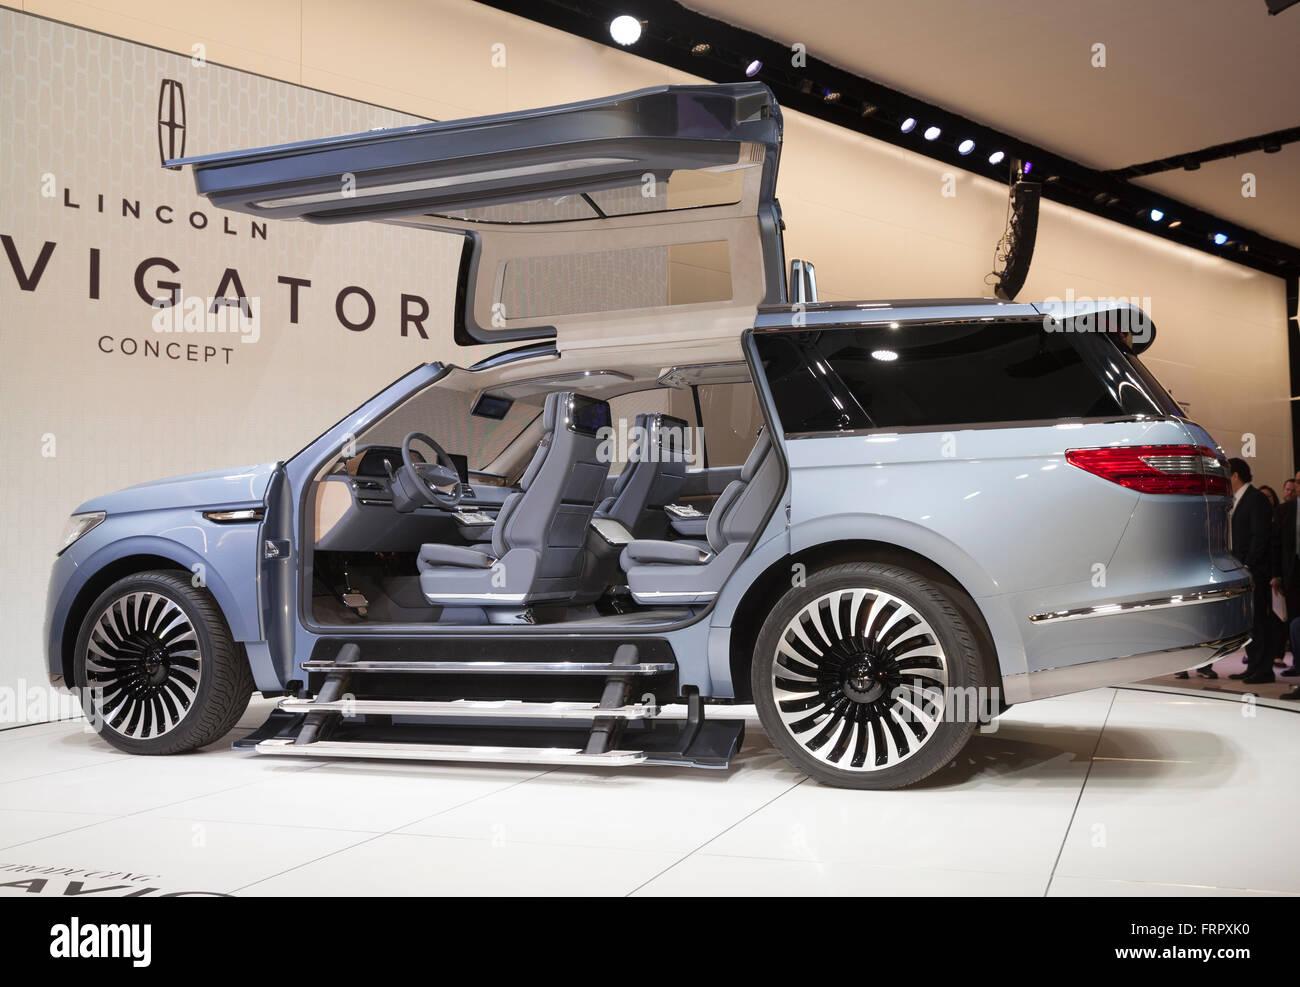 http://c8.alamy.com/comp/FRPXK0/new-york-usa-23rd-march-2016-lincoln-navigator-concept-car-on-display-FRPXK0.jpg